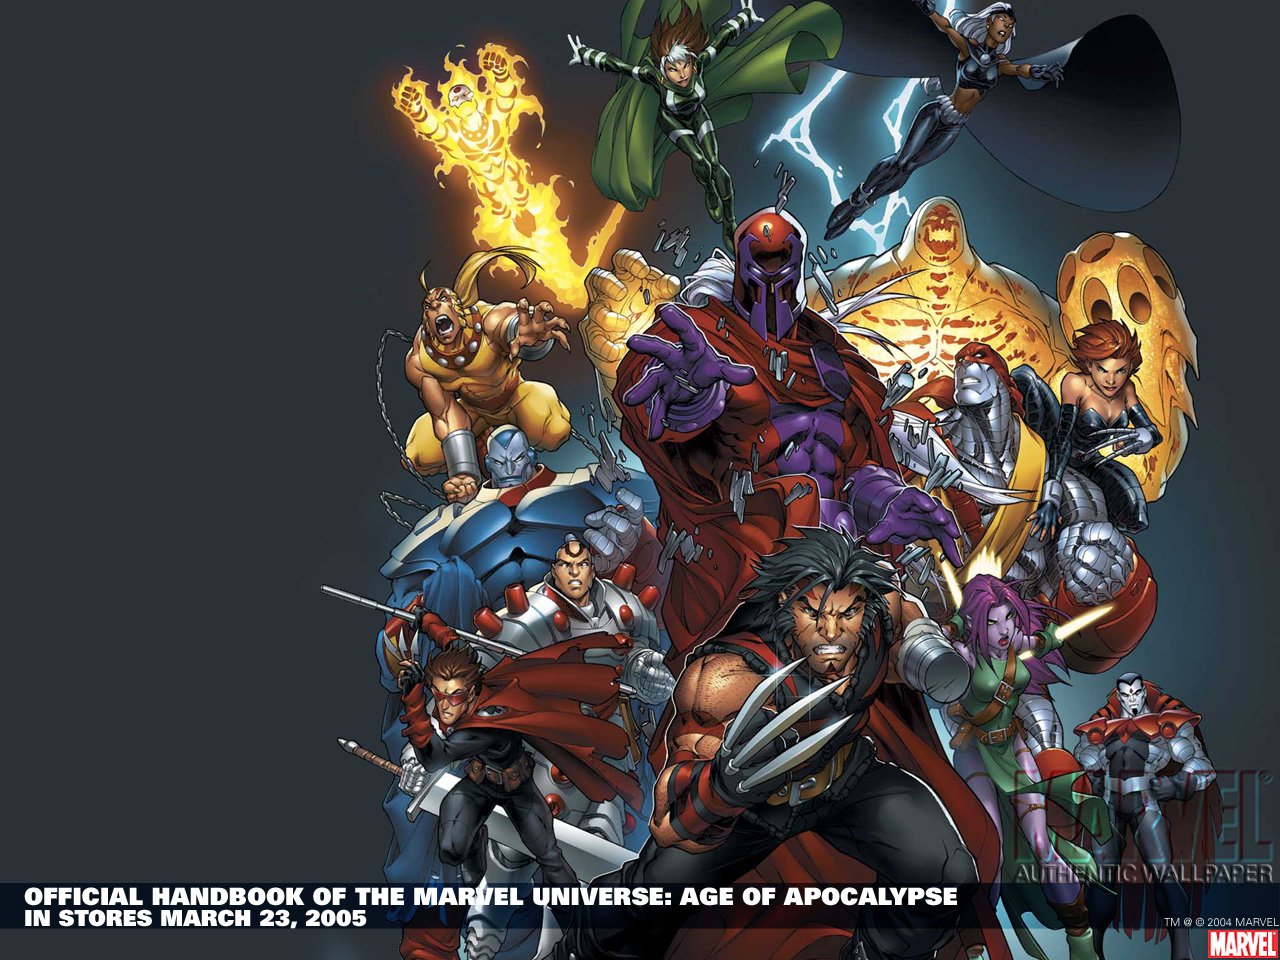 Marvel Hd Wallpaper Techmynd 3 500x375 100 Marvel Super 1280x960